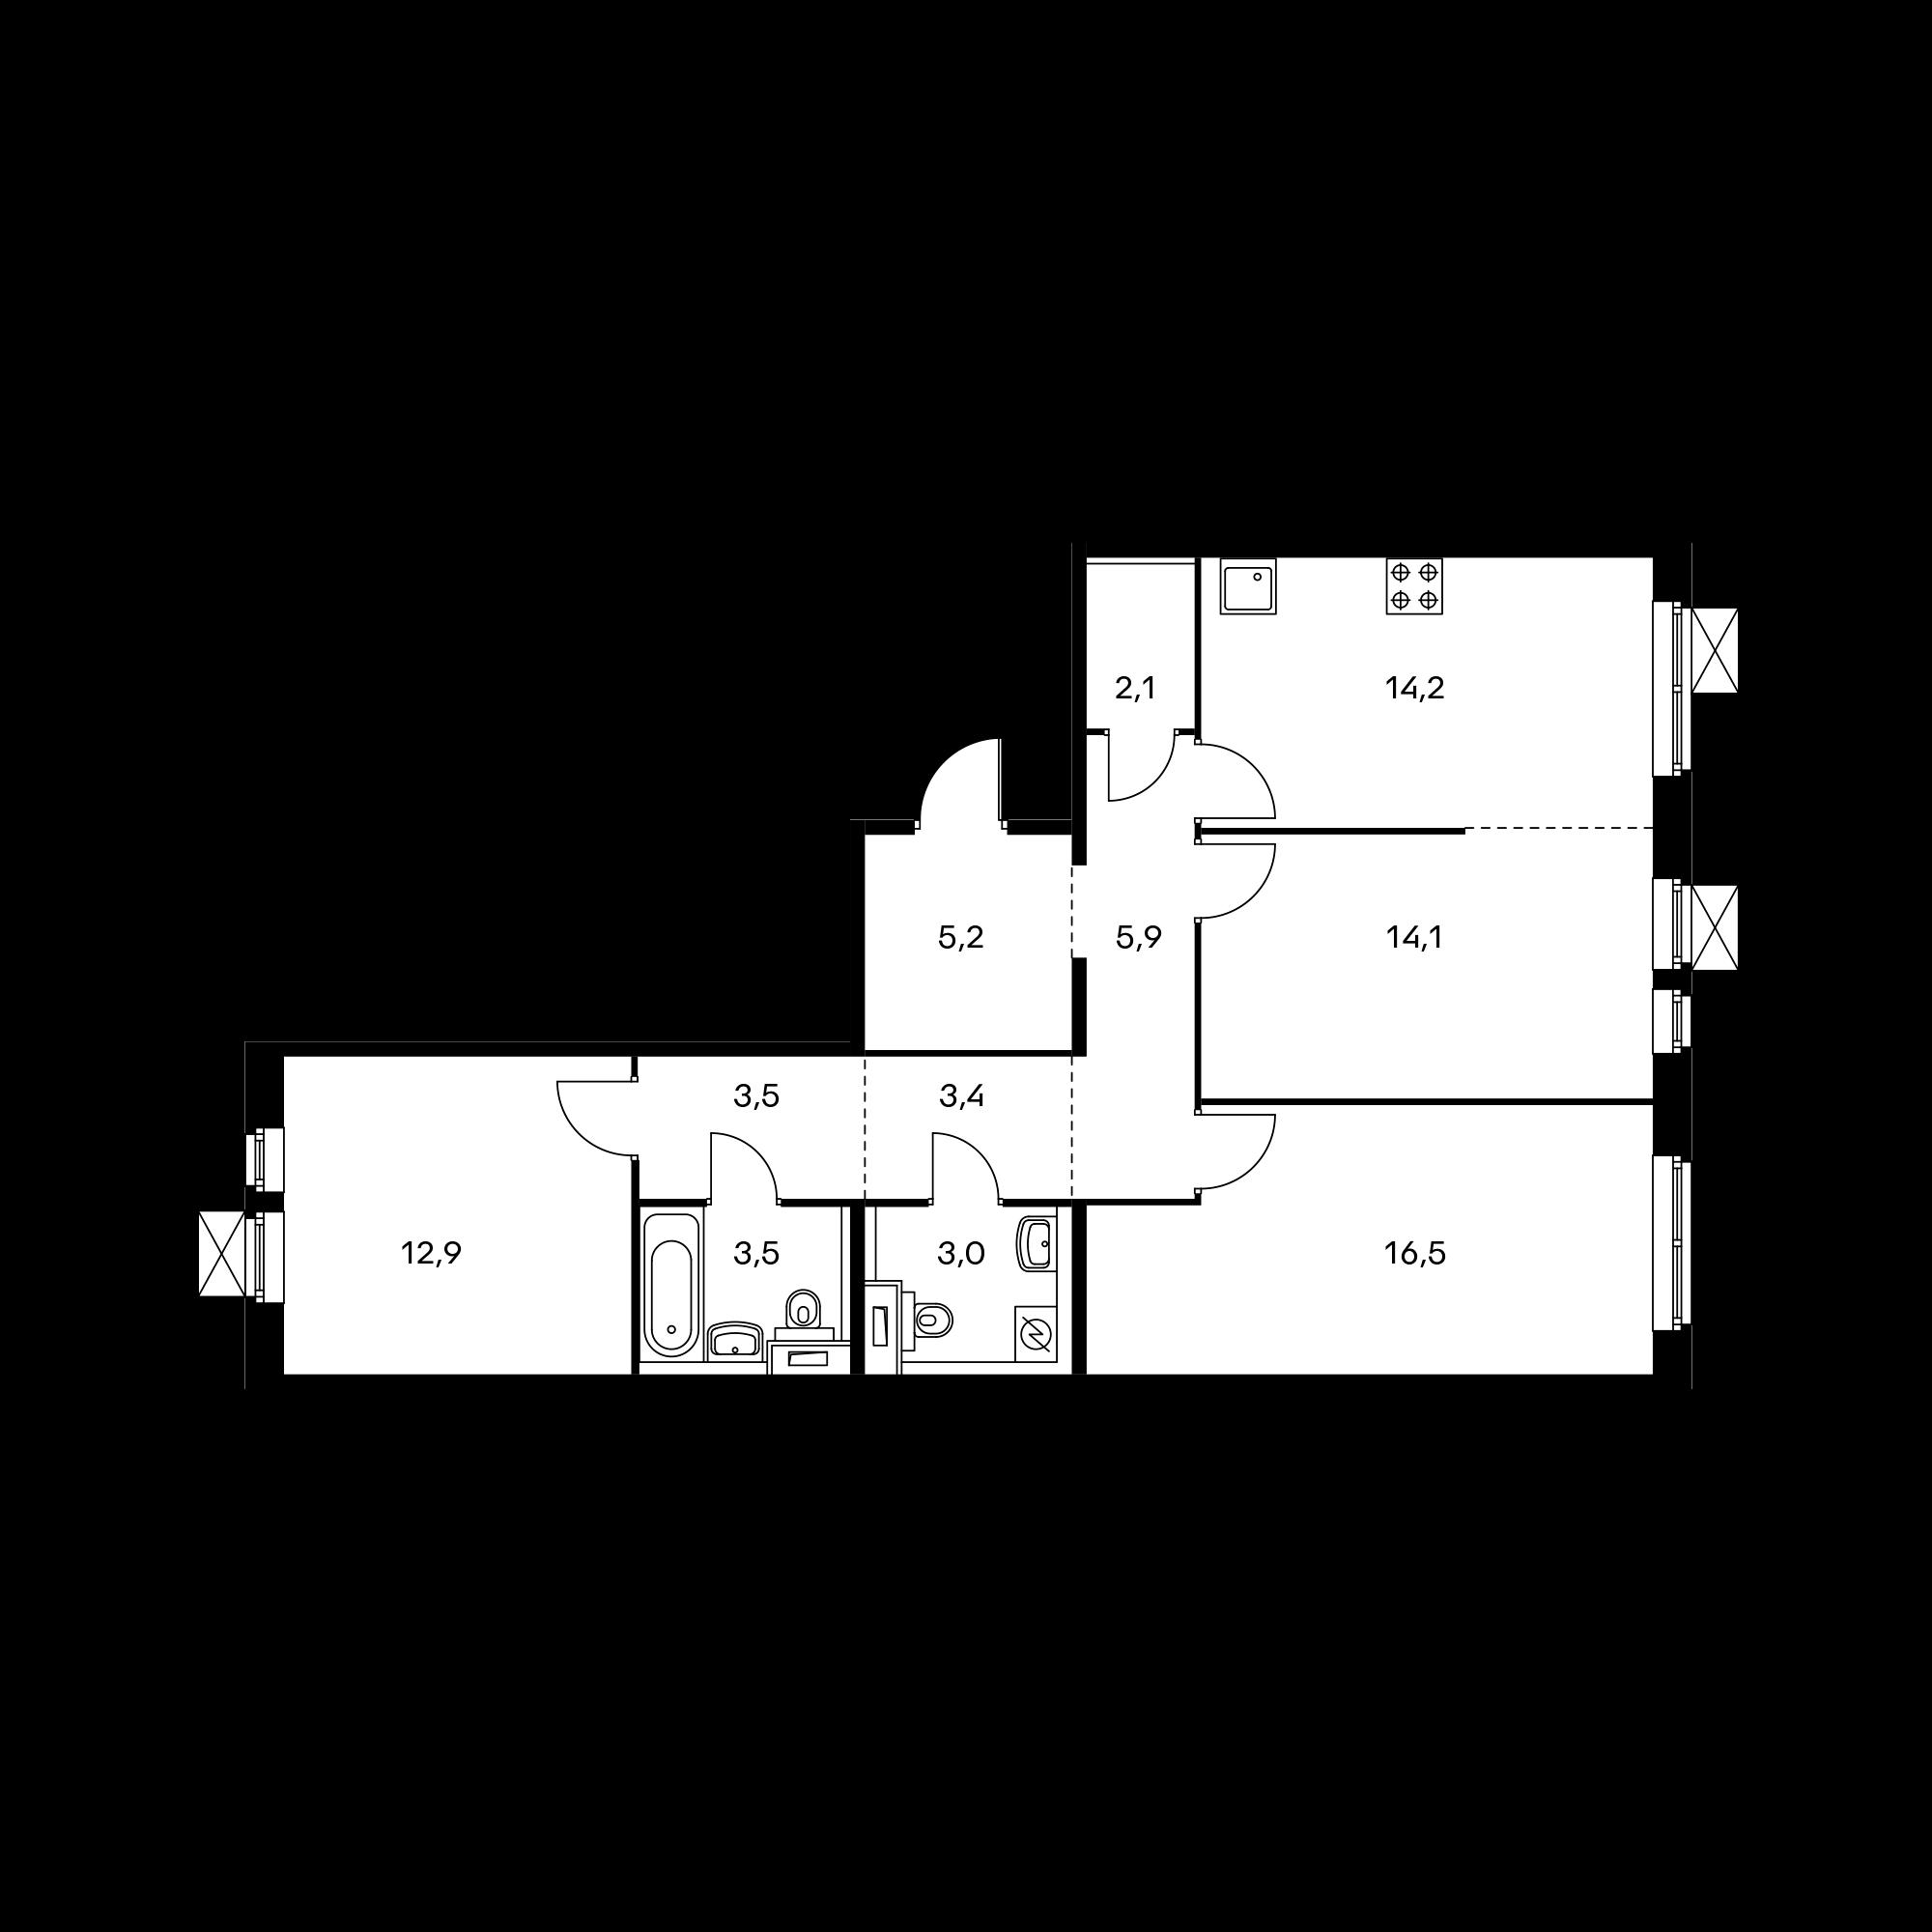 3KL13_9.0-2